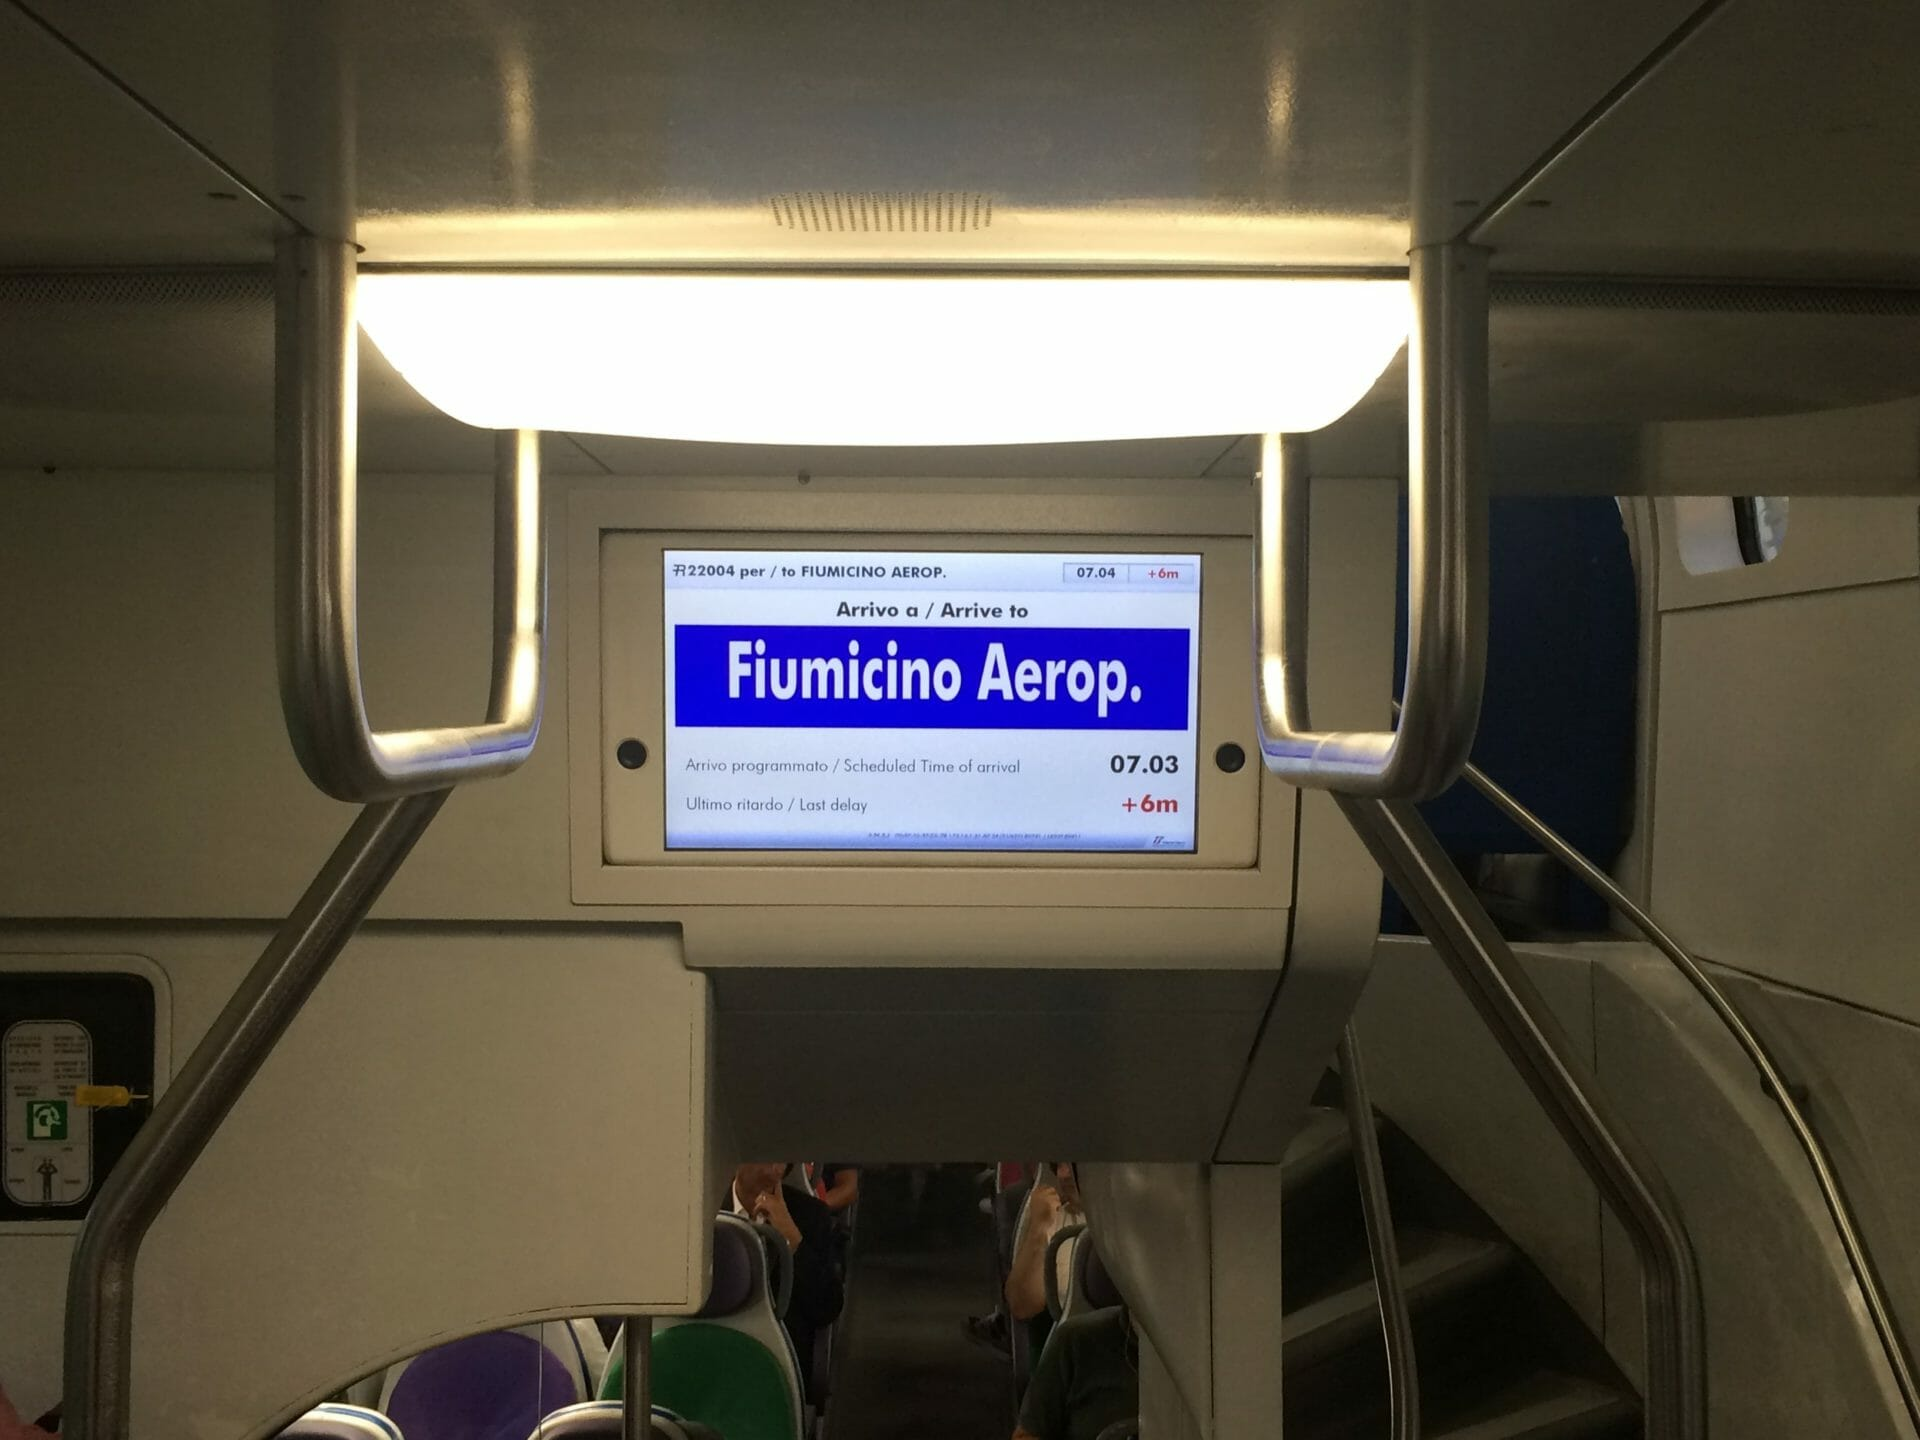 Rome international airports transport Fiuminico